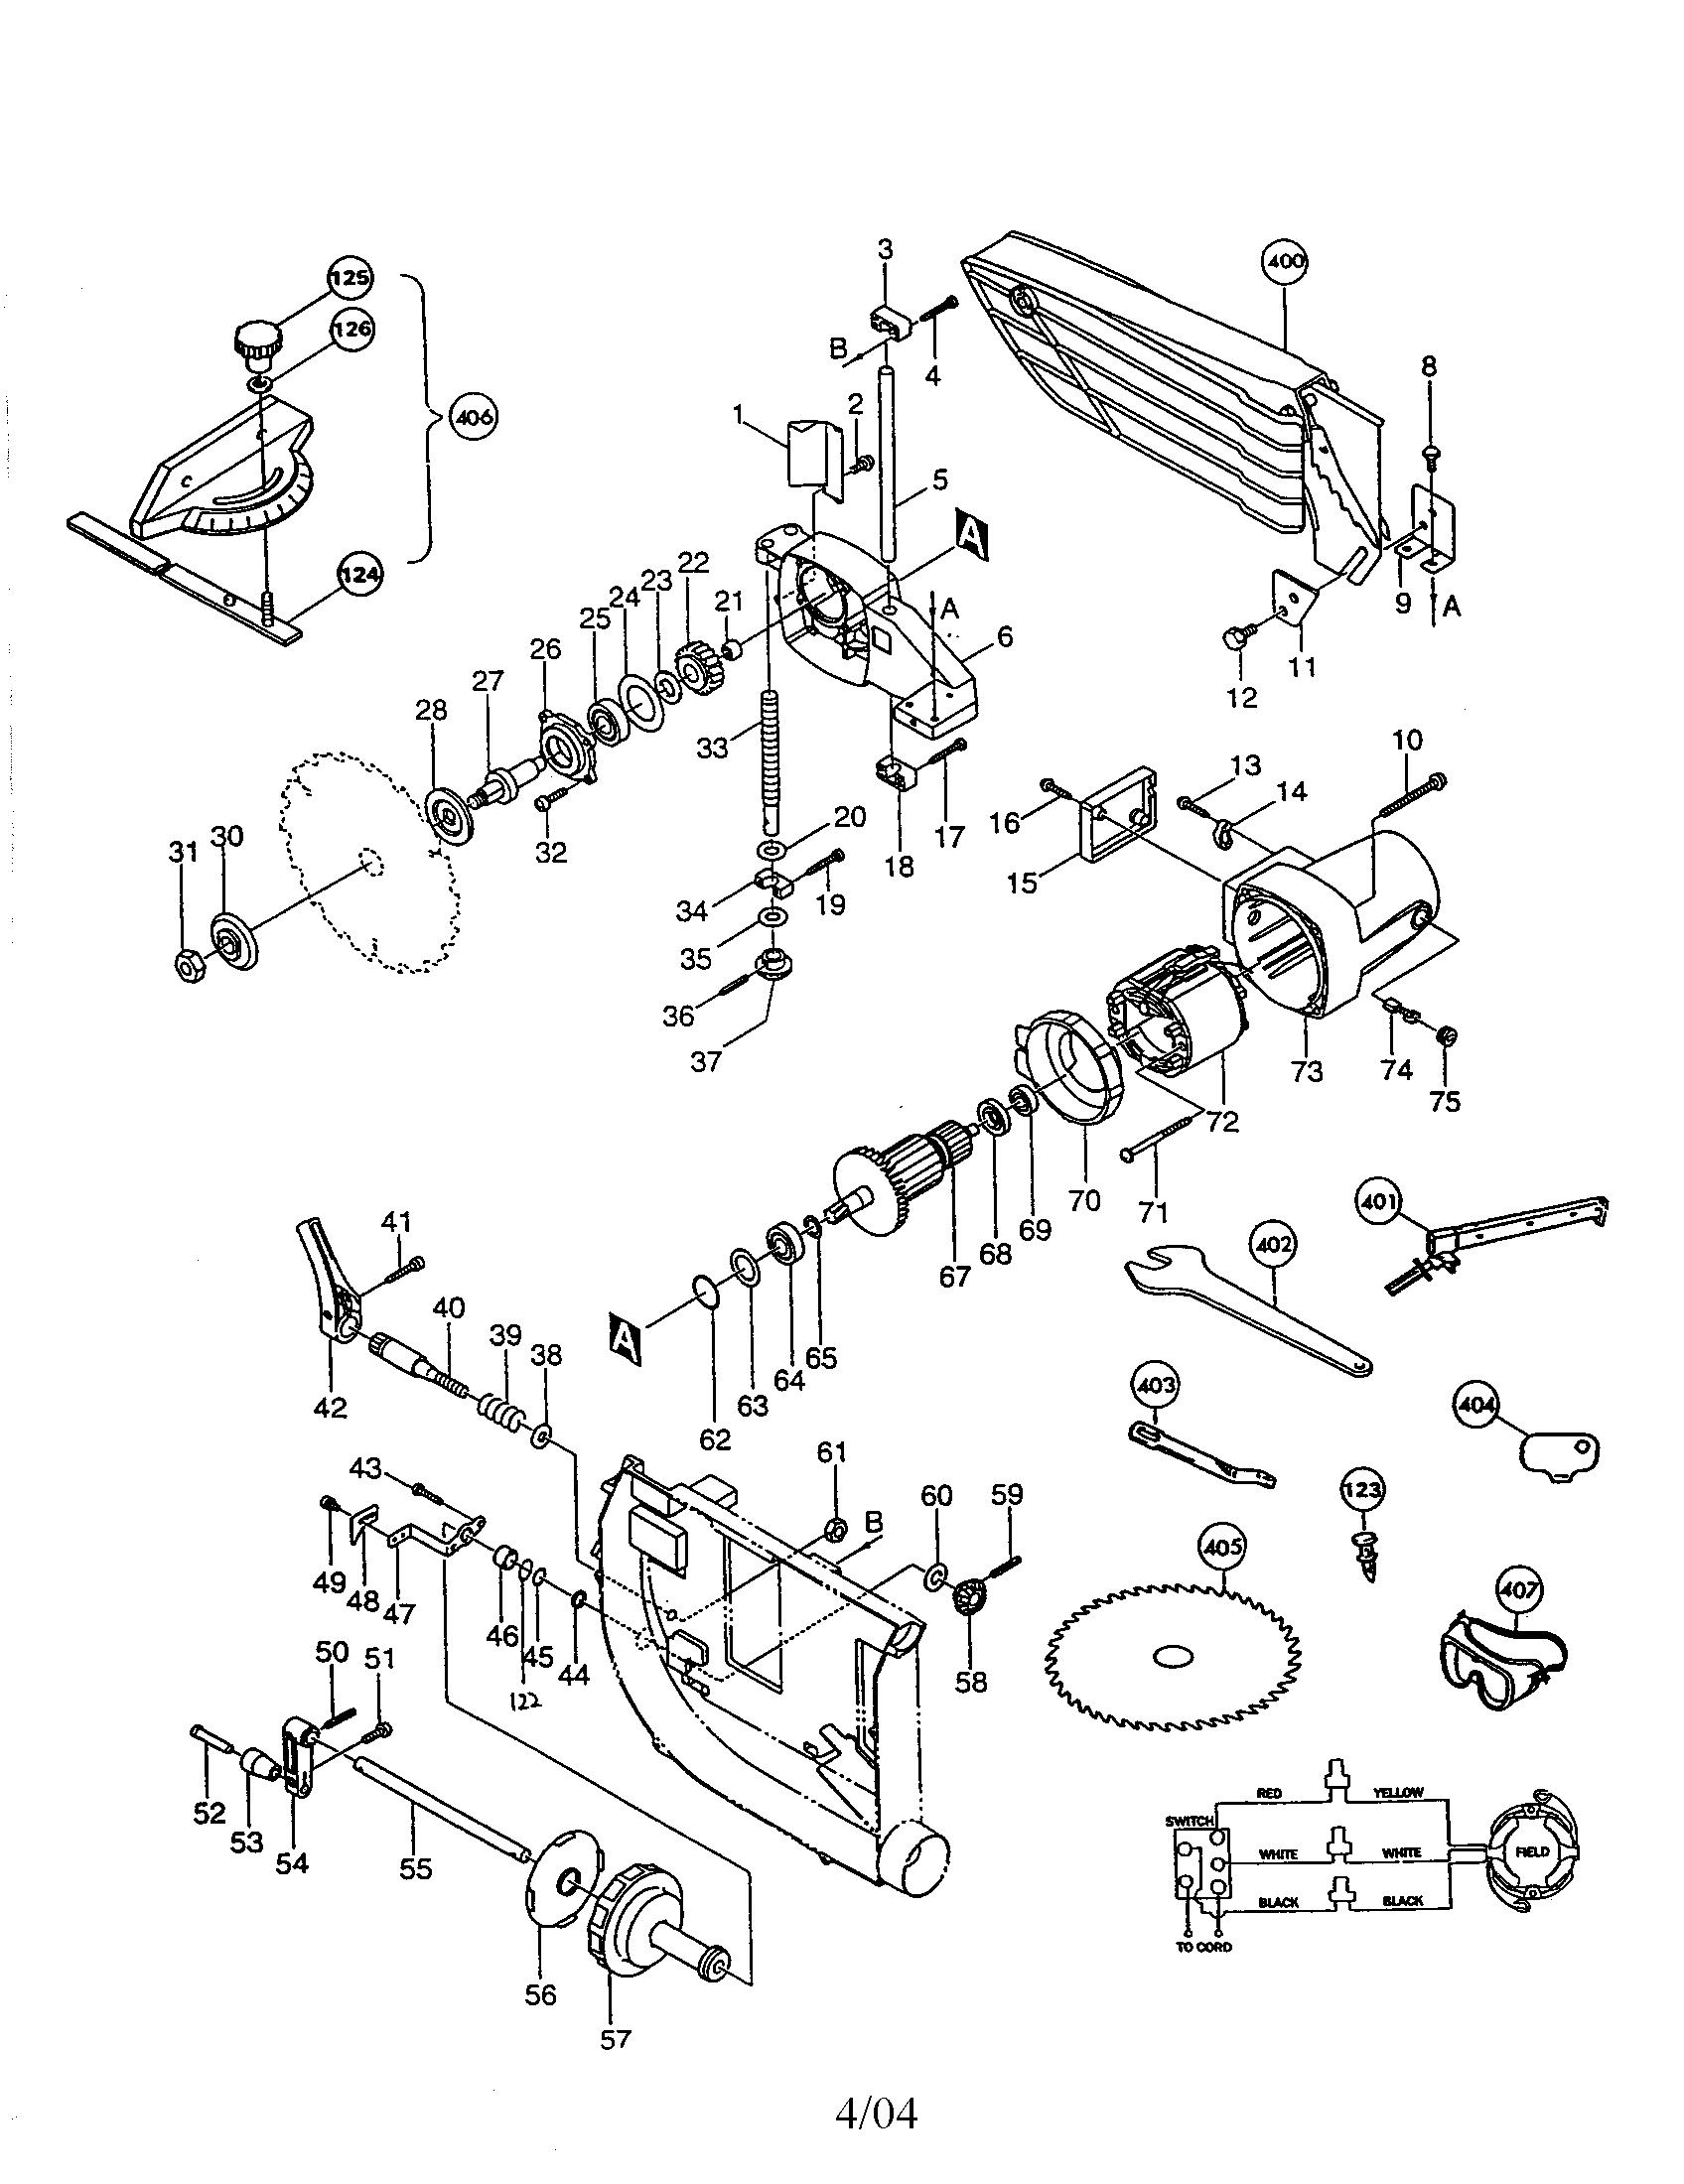 Makita model 2703 table saw genuine parts